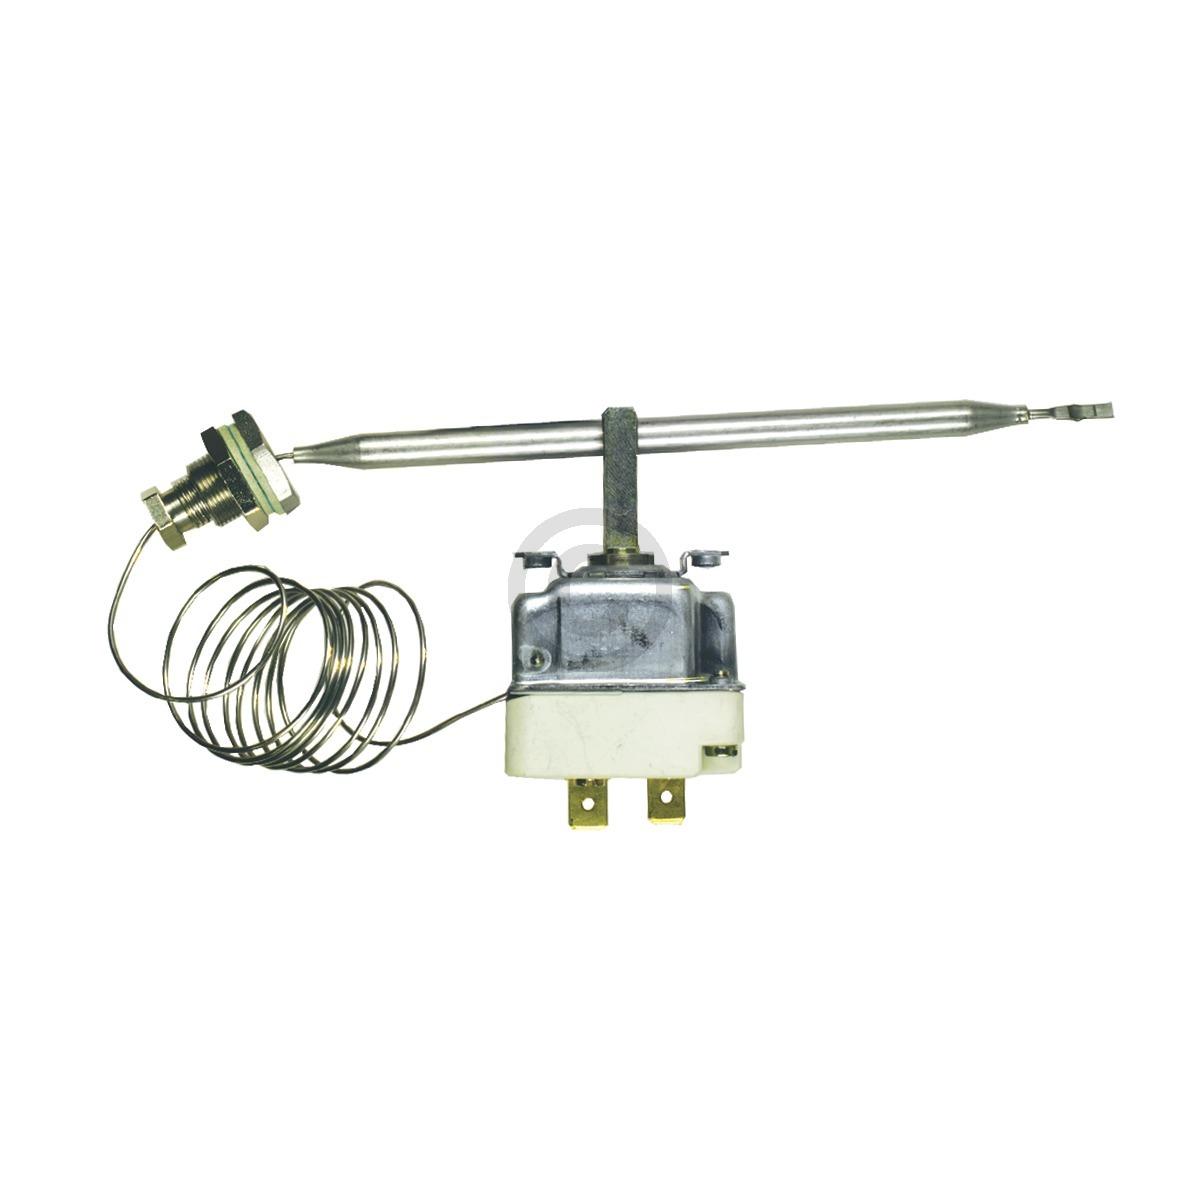 Thermostat 30-110° 55.19022.801 EGO